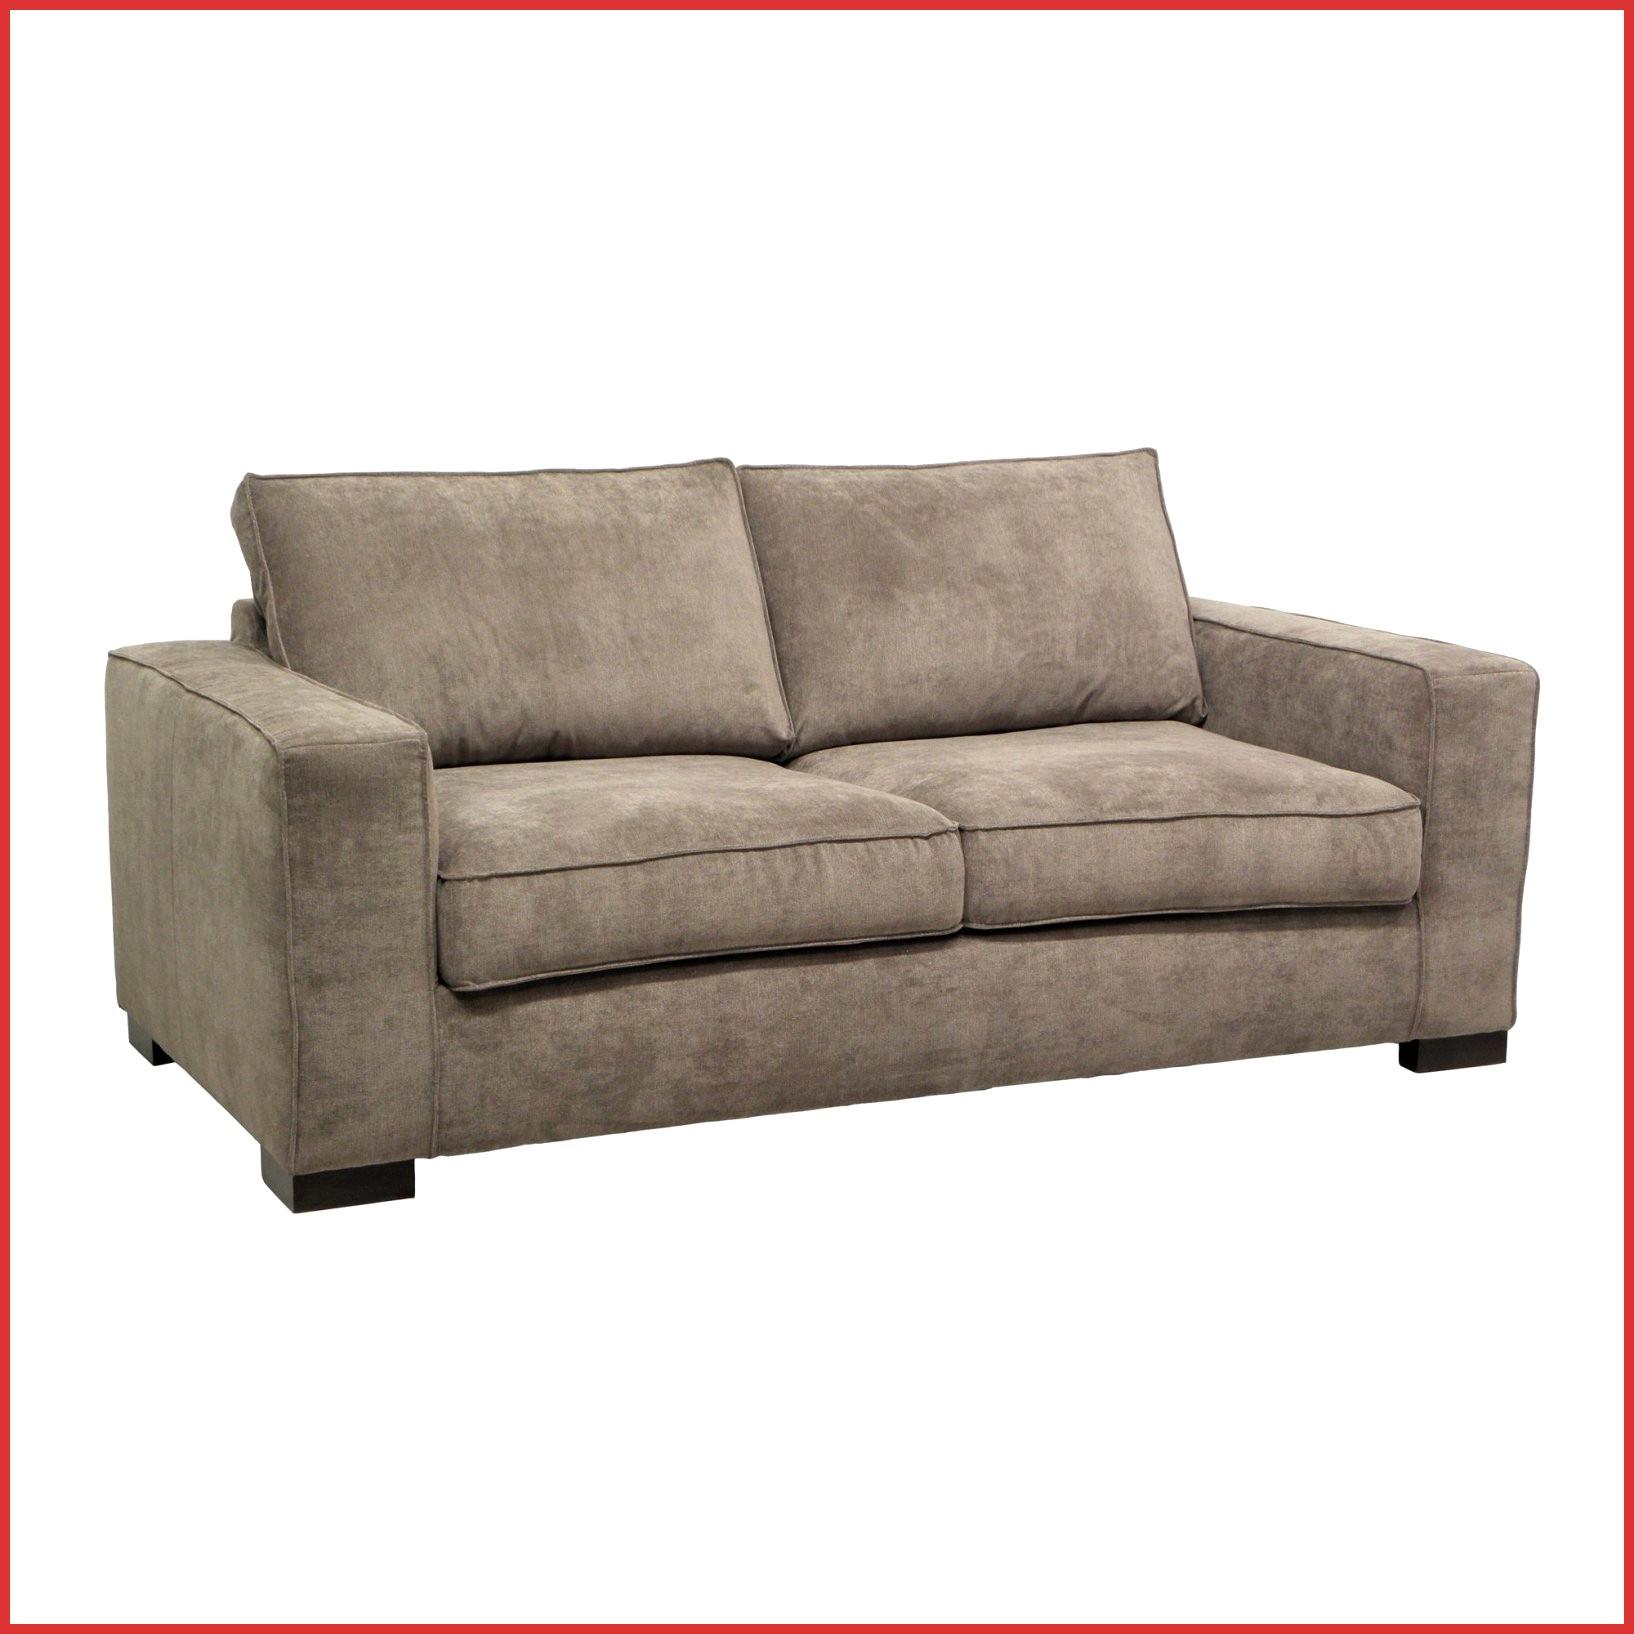 Canapé Simili Cuir but Luxe Photos Canap Convertible 3 Places Conforama 11 Lit 2 Pas Cher Ikea but